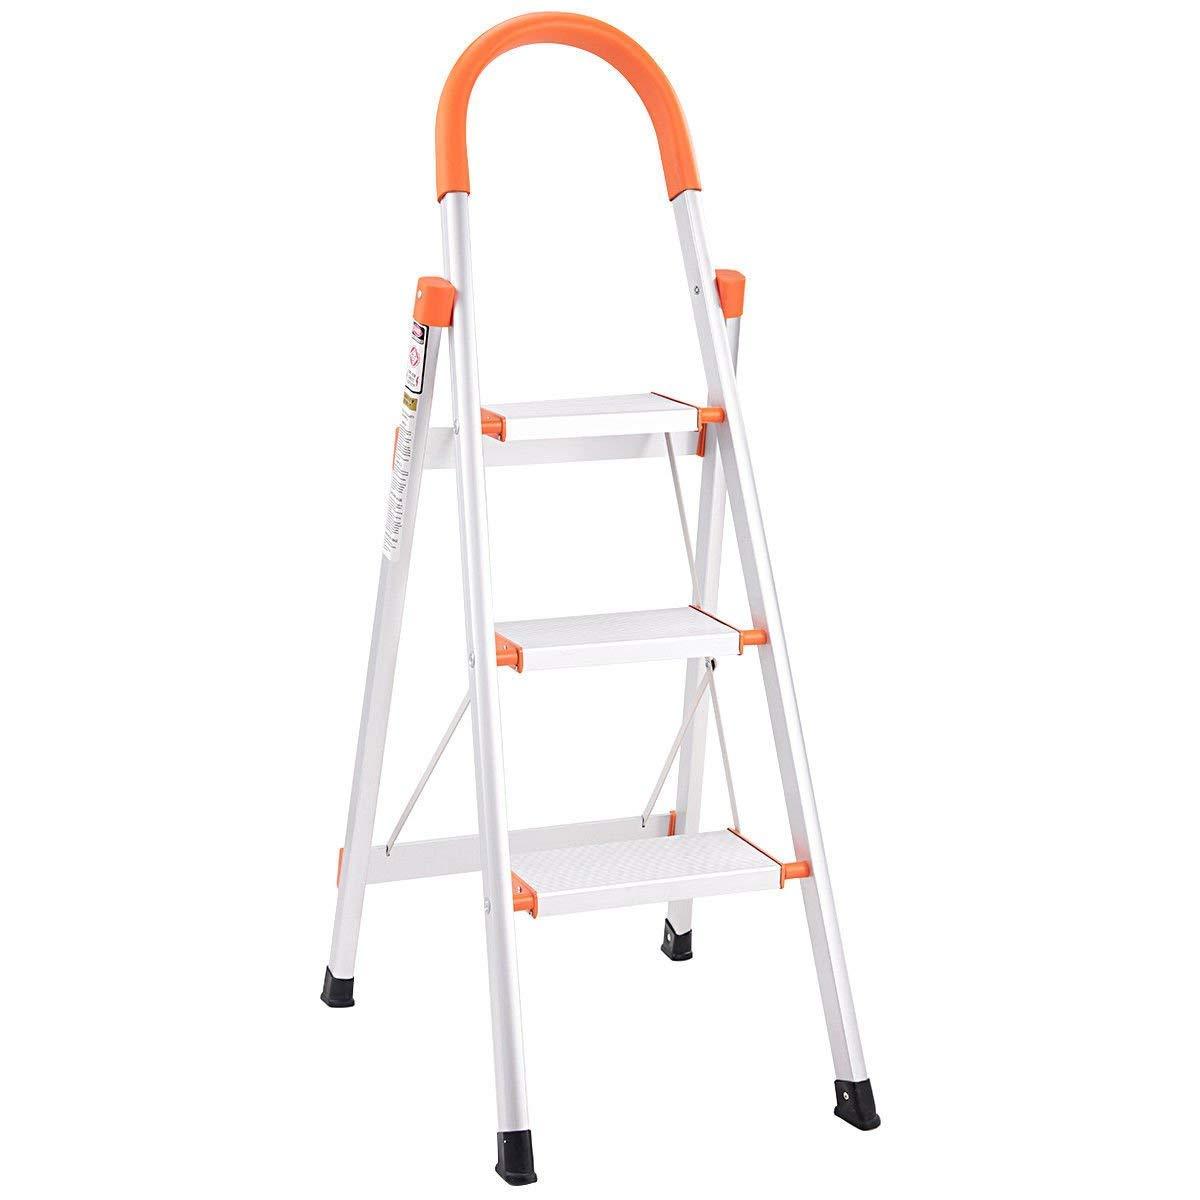 Giantex 3 Step Ladder Folding Stepladder Rating 3-Foot Ladder Aluminum Step Stool Ladder Folding Platform Stool 330 lbs Load Capacity Lightweight Multi-Use Ladder w/Anti-Slip Handgrip and Wide Pedal